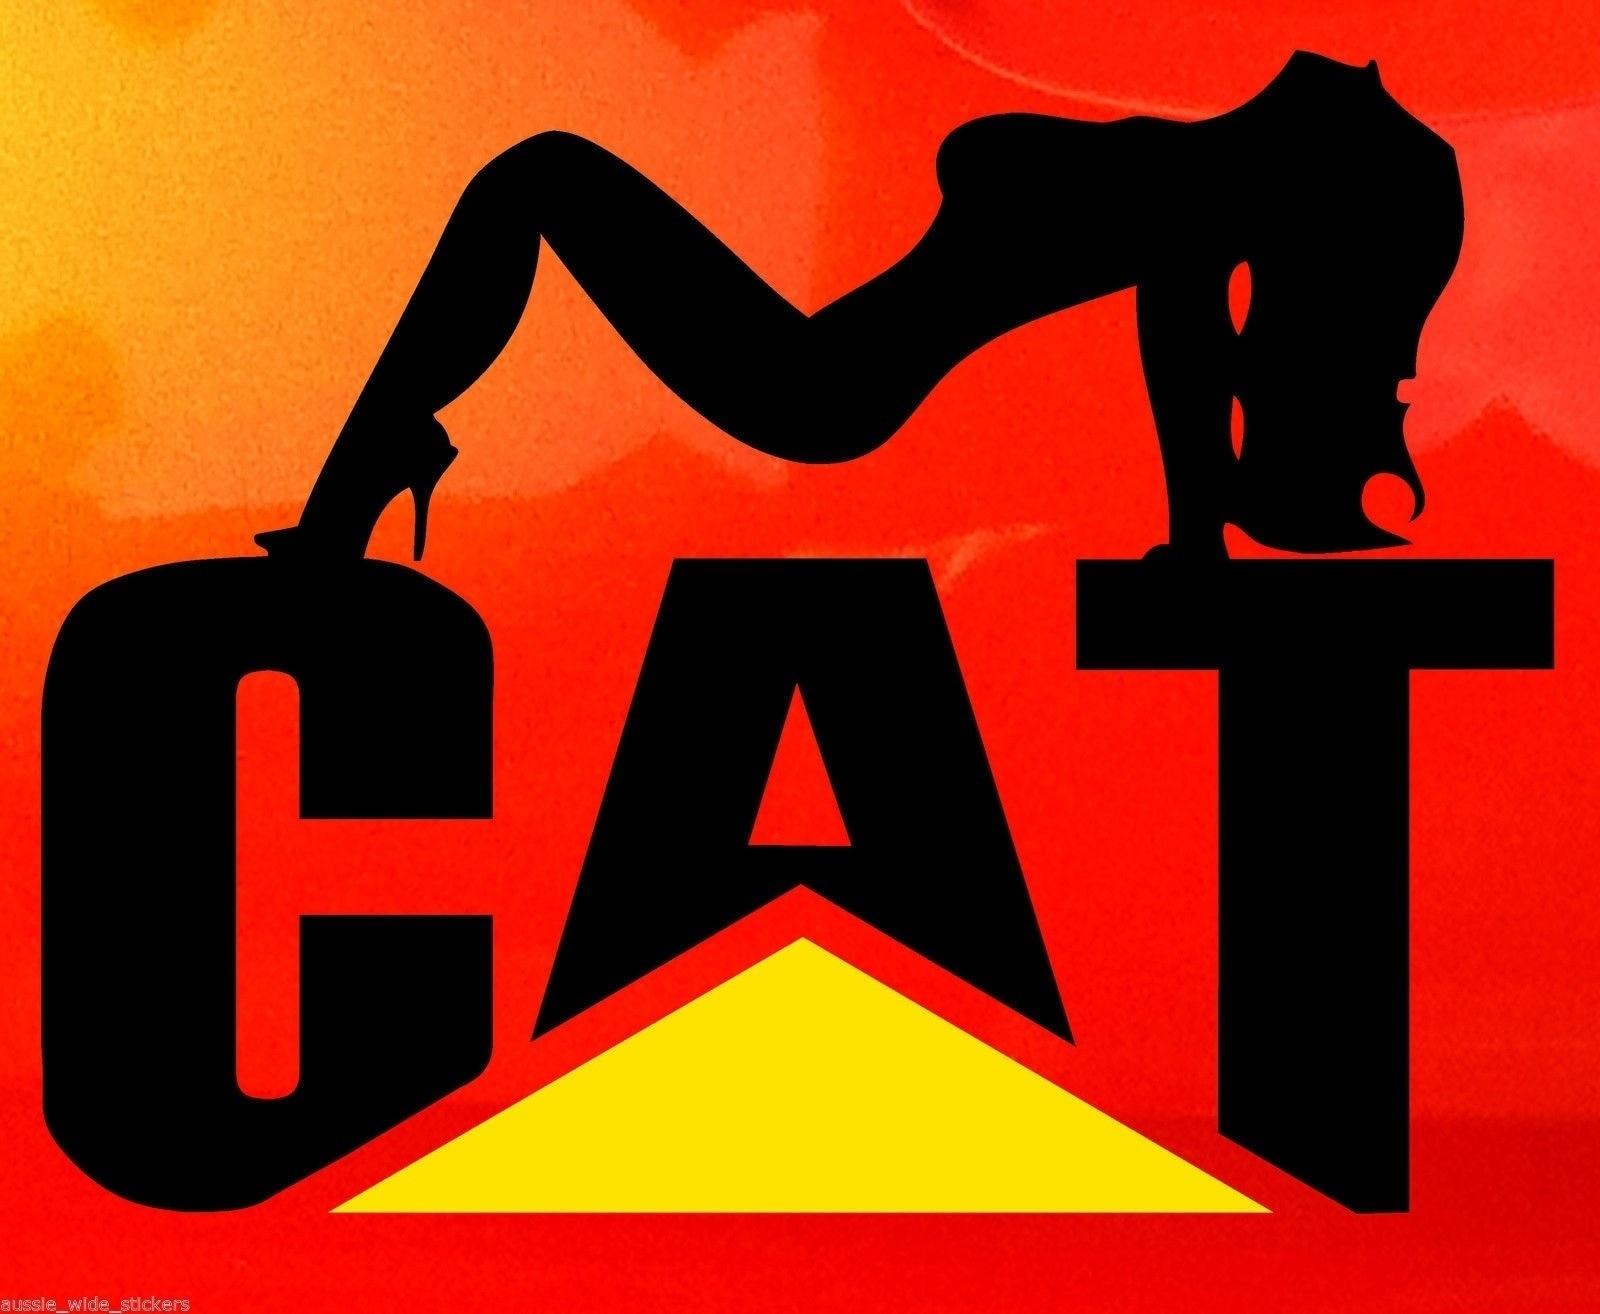 Pegatina de pollito de gato grande de 30x23cm, pegatina de vinilo de corte Ute de oruga